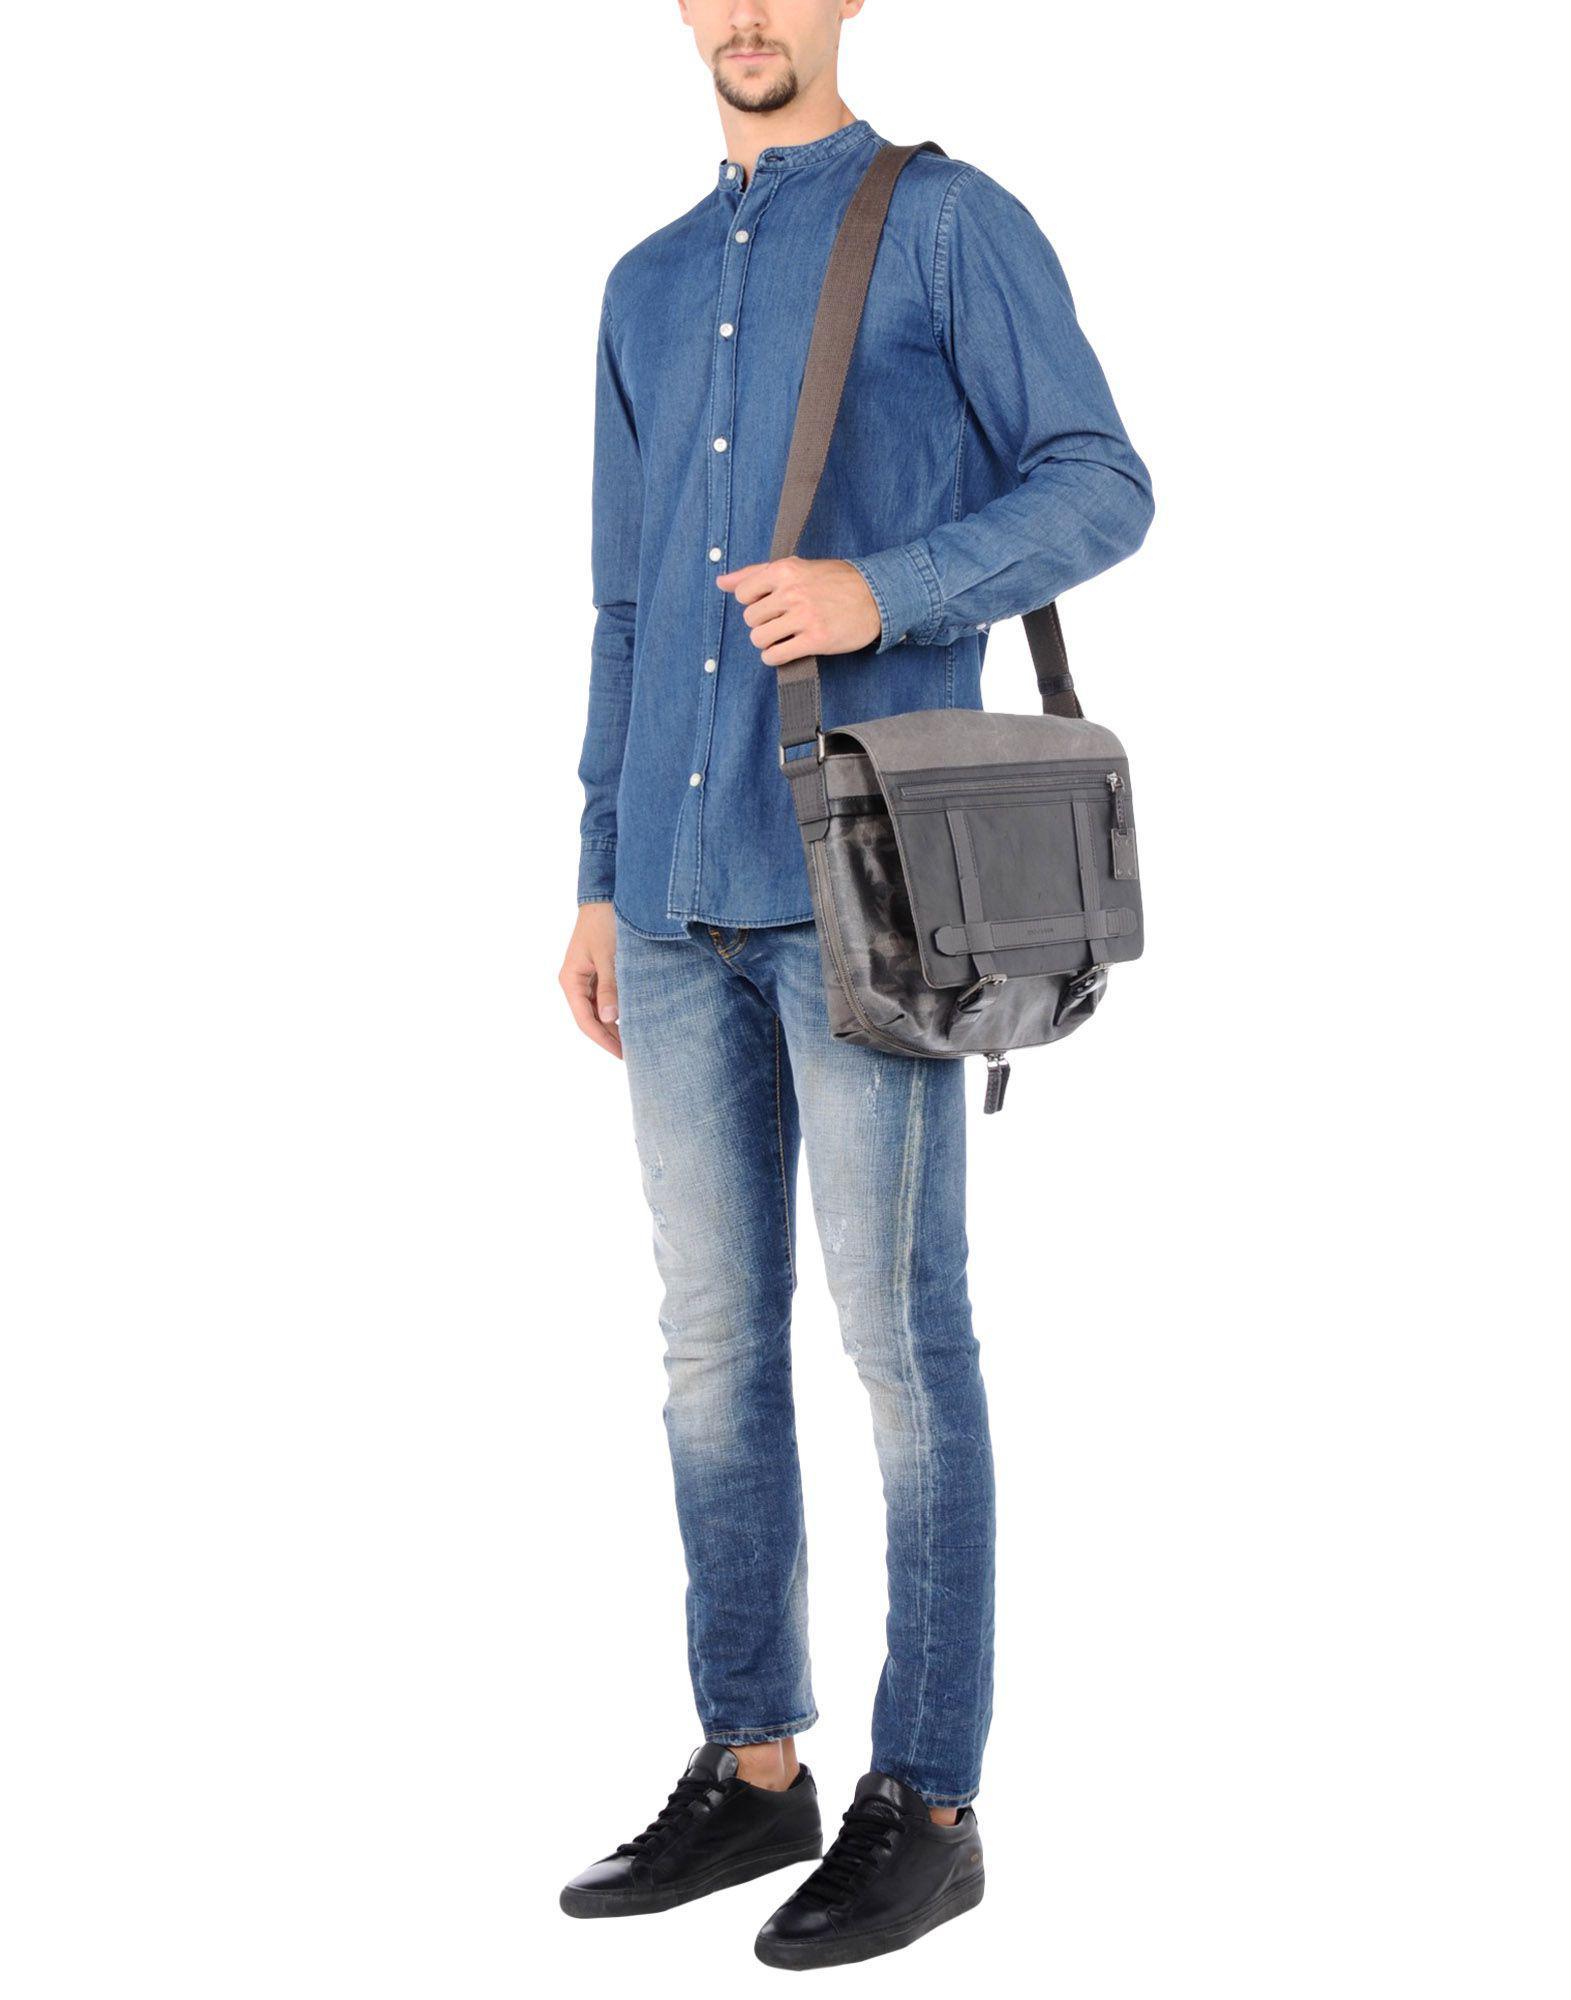 Dolce & Gabbana Leather Cross-body Bag in Lead (Grey) for Men